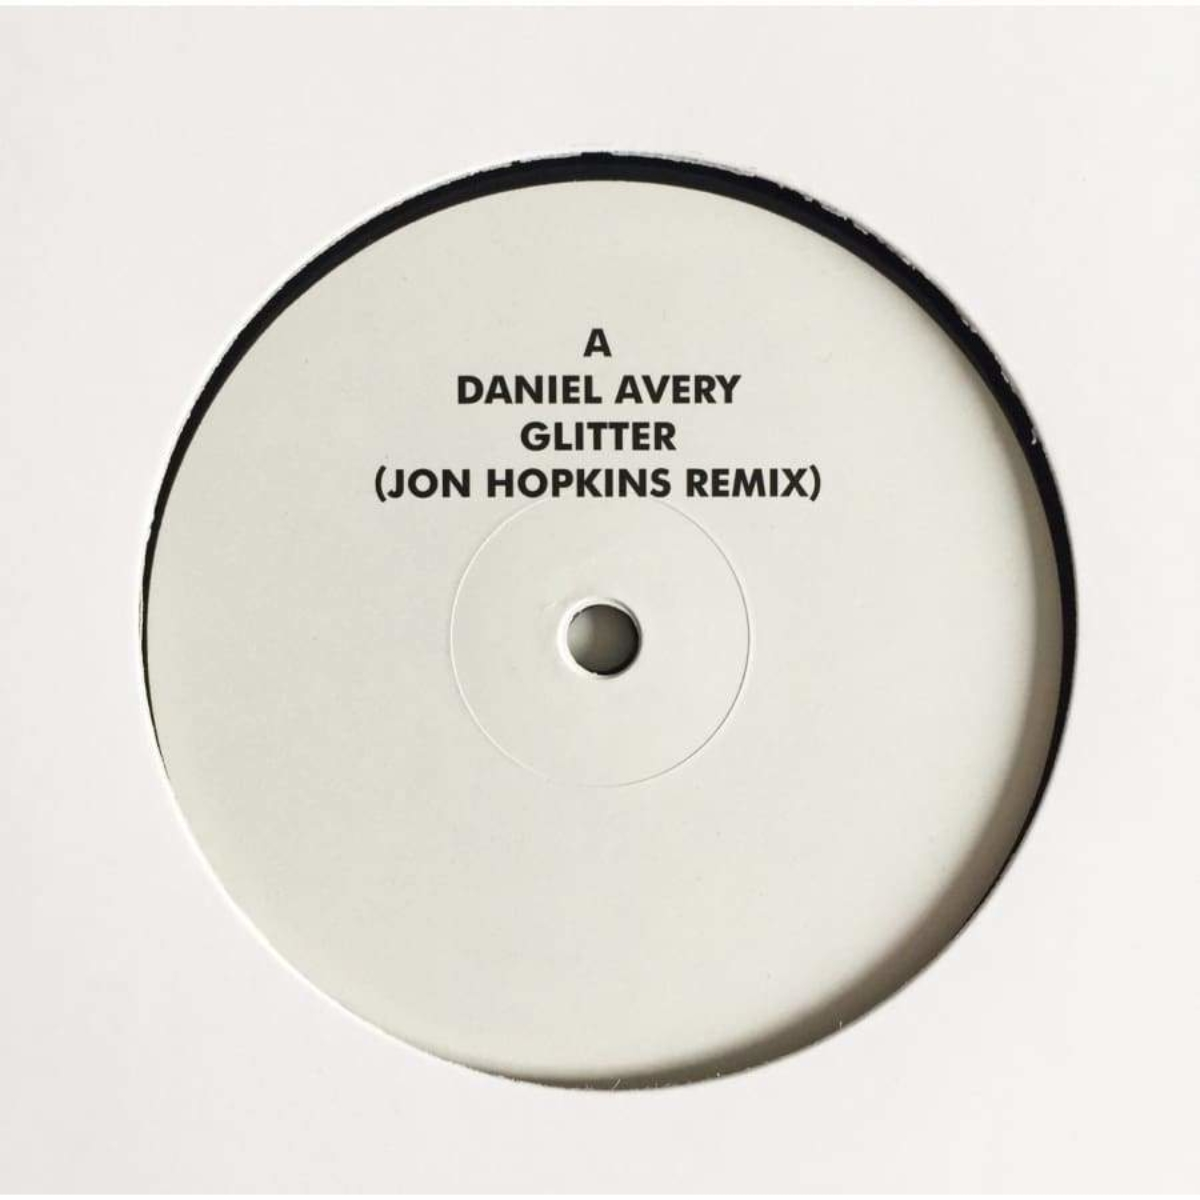 Daniel Avery and Jon Hopkins trade remixes